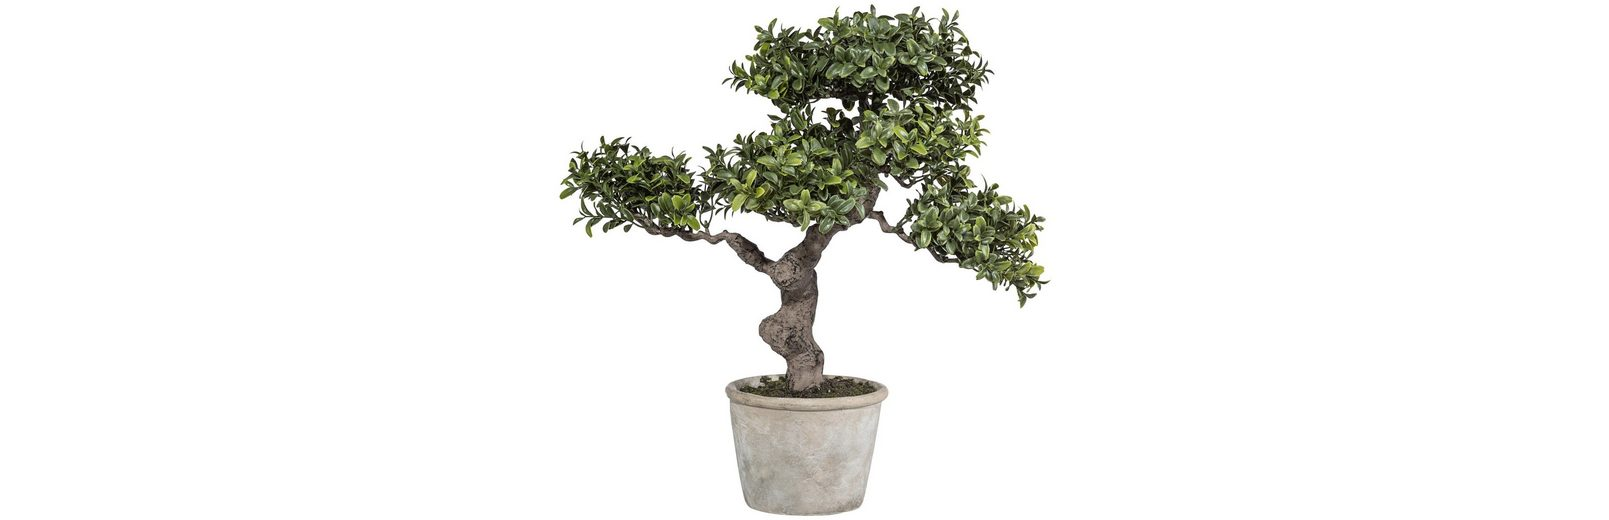 Kunstpflanze »Bonsai Murraya« inkl. Pflanzgefäß